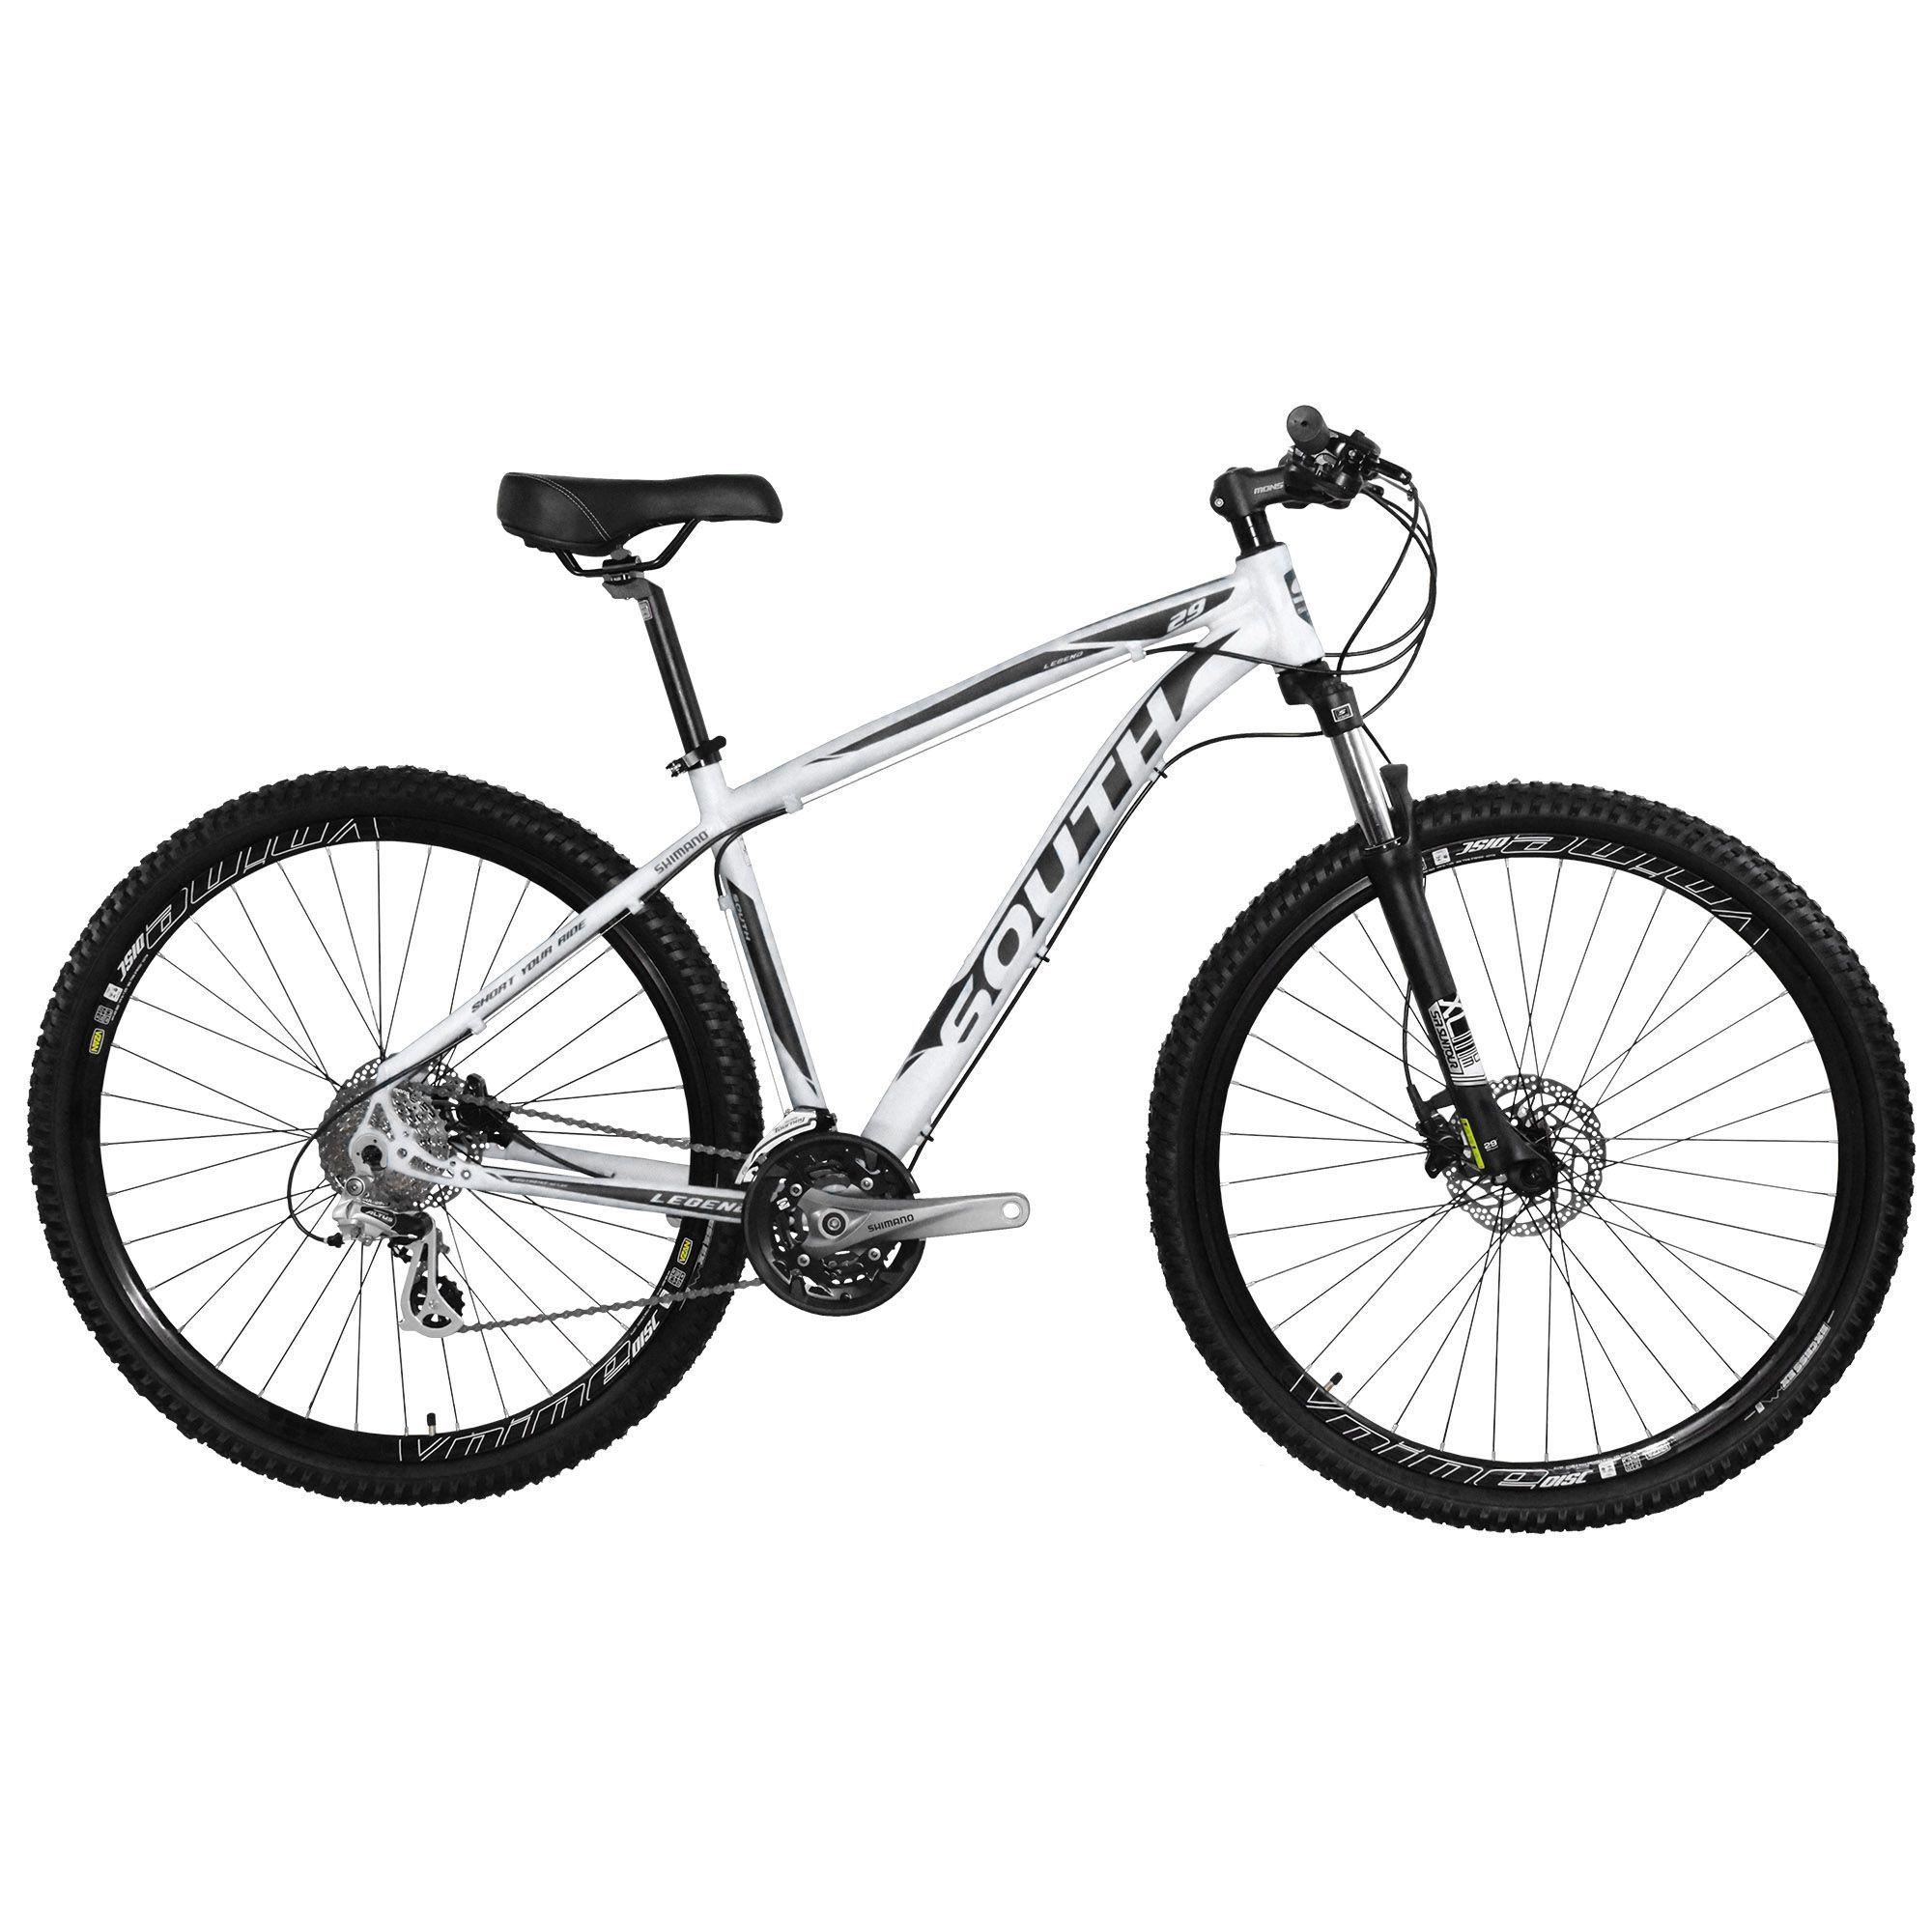 Bicicleta Legend 2018 Altus - 24 Marchas - Freios Hidráulicos - Altus